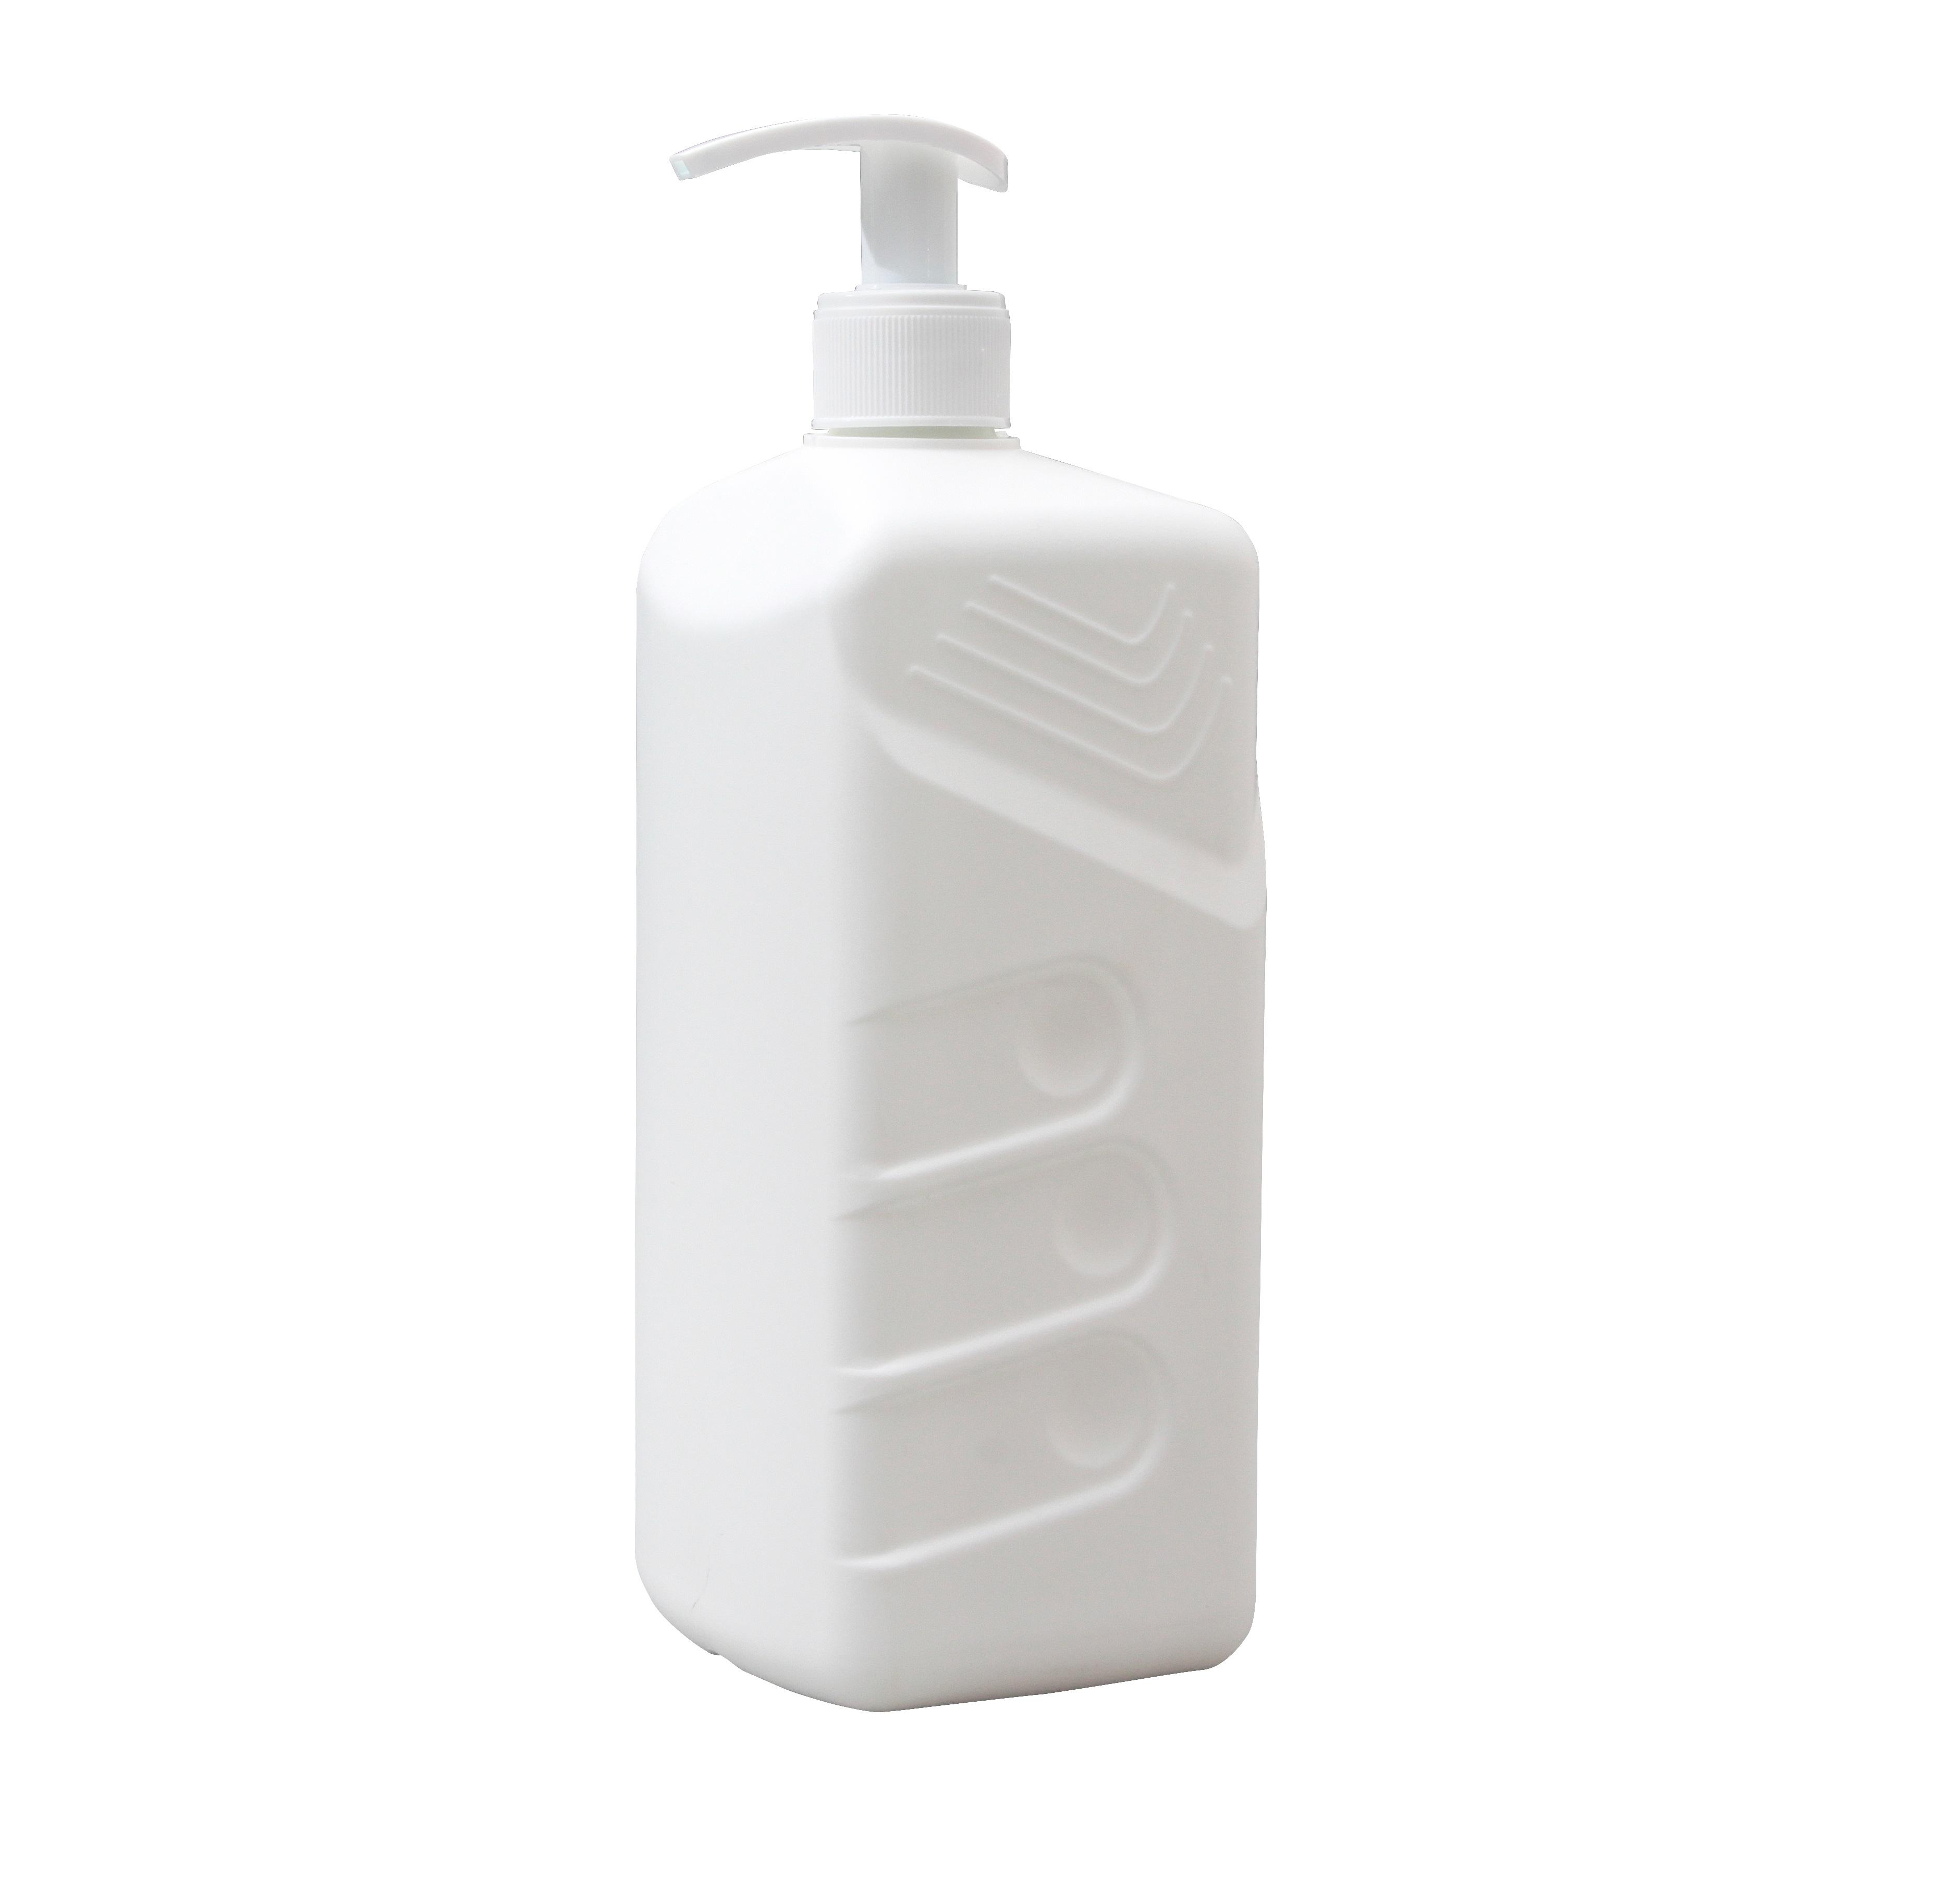 1 liter Hdpe Sanitizer Bottle